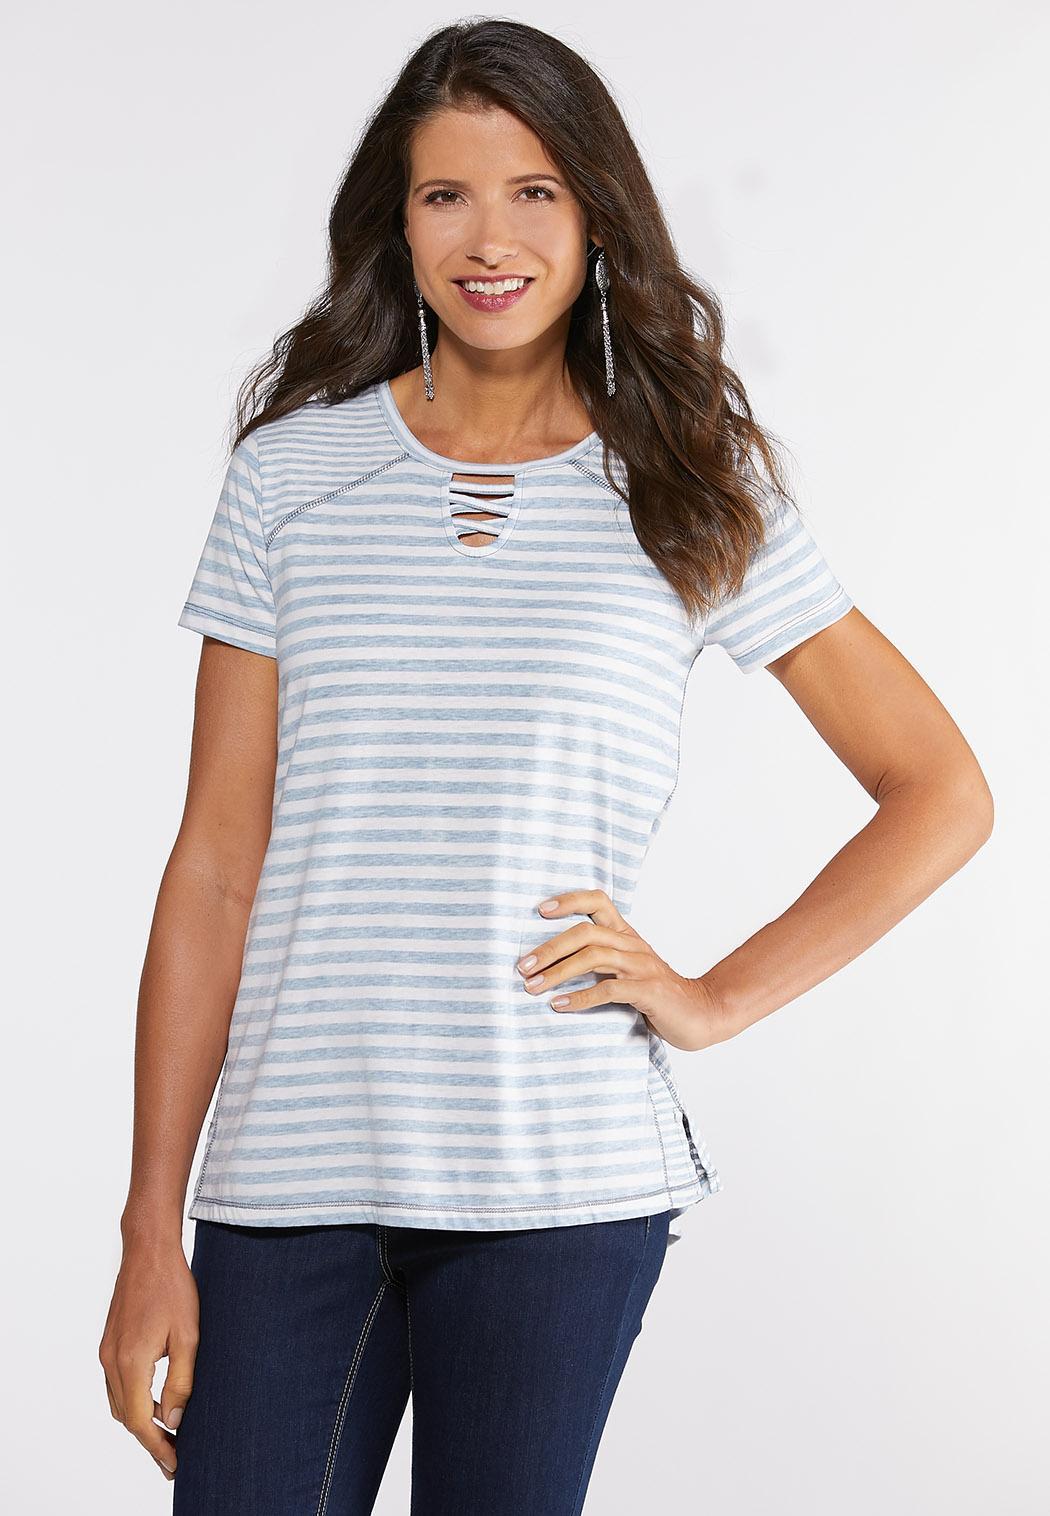 c83287f9c Women's Plus Size Tees & Knit Tops